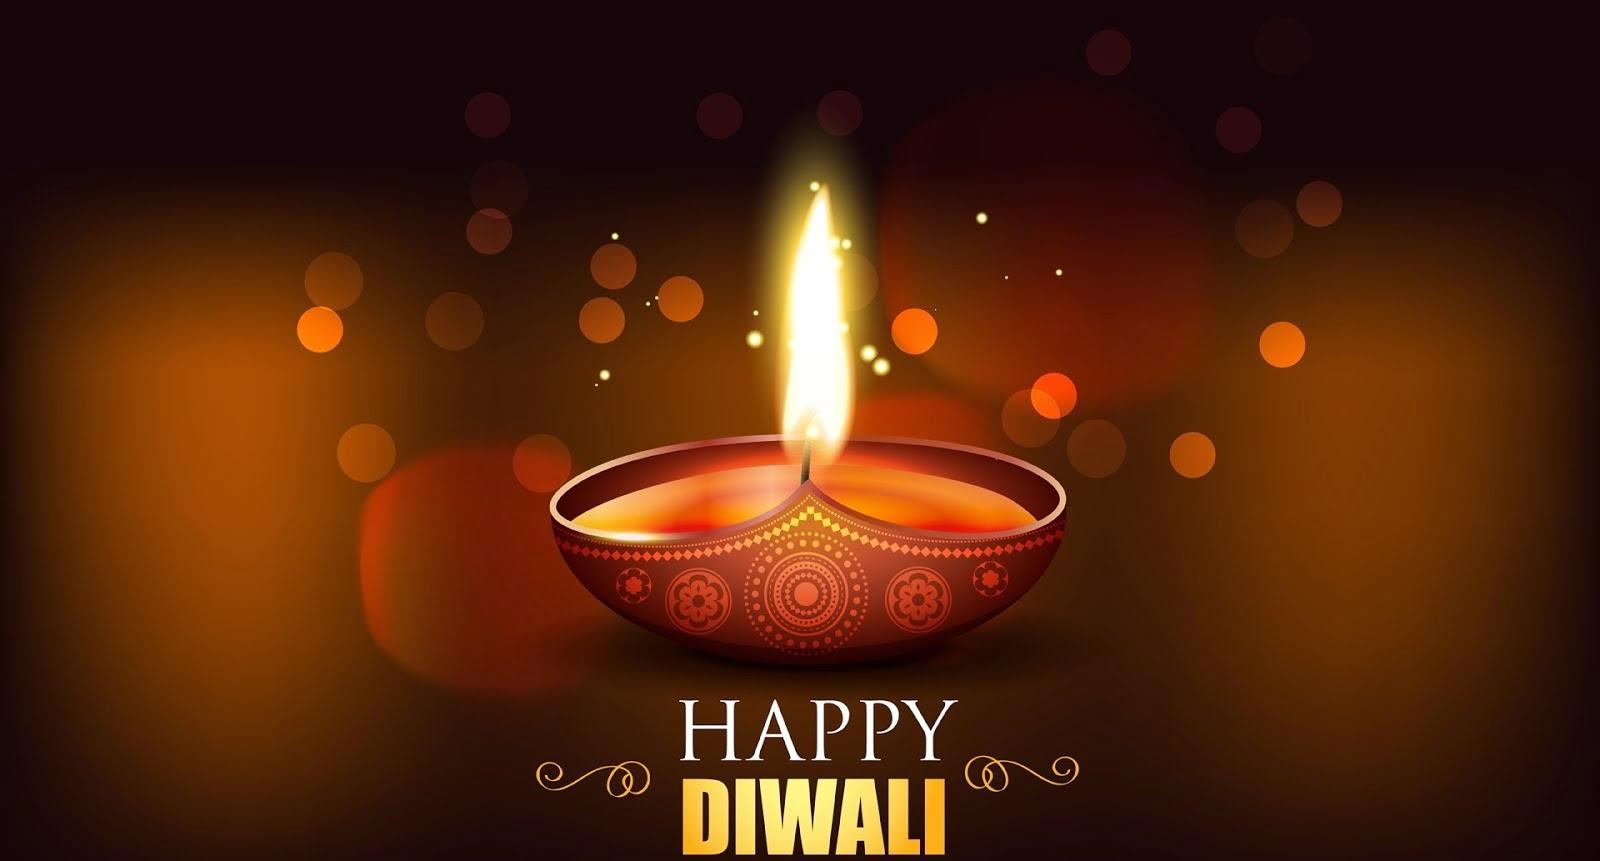 Happy Diwali Wishes In Tamil